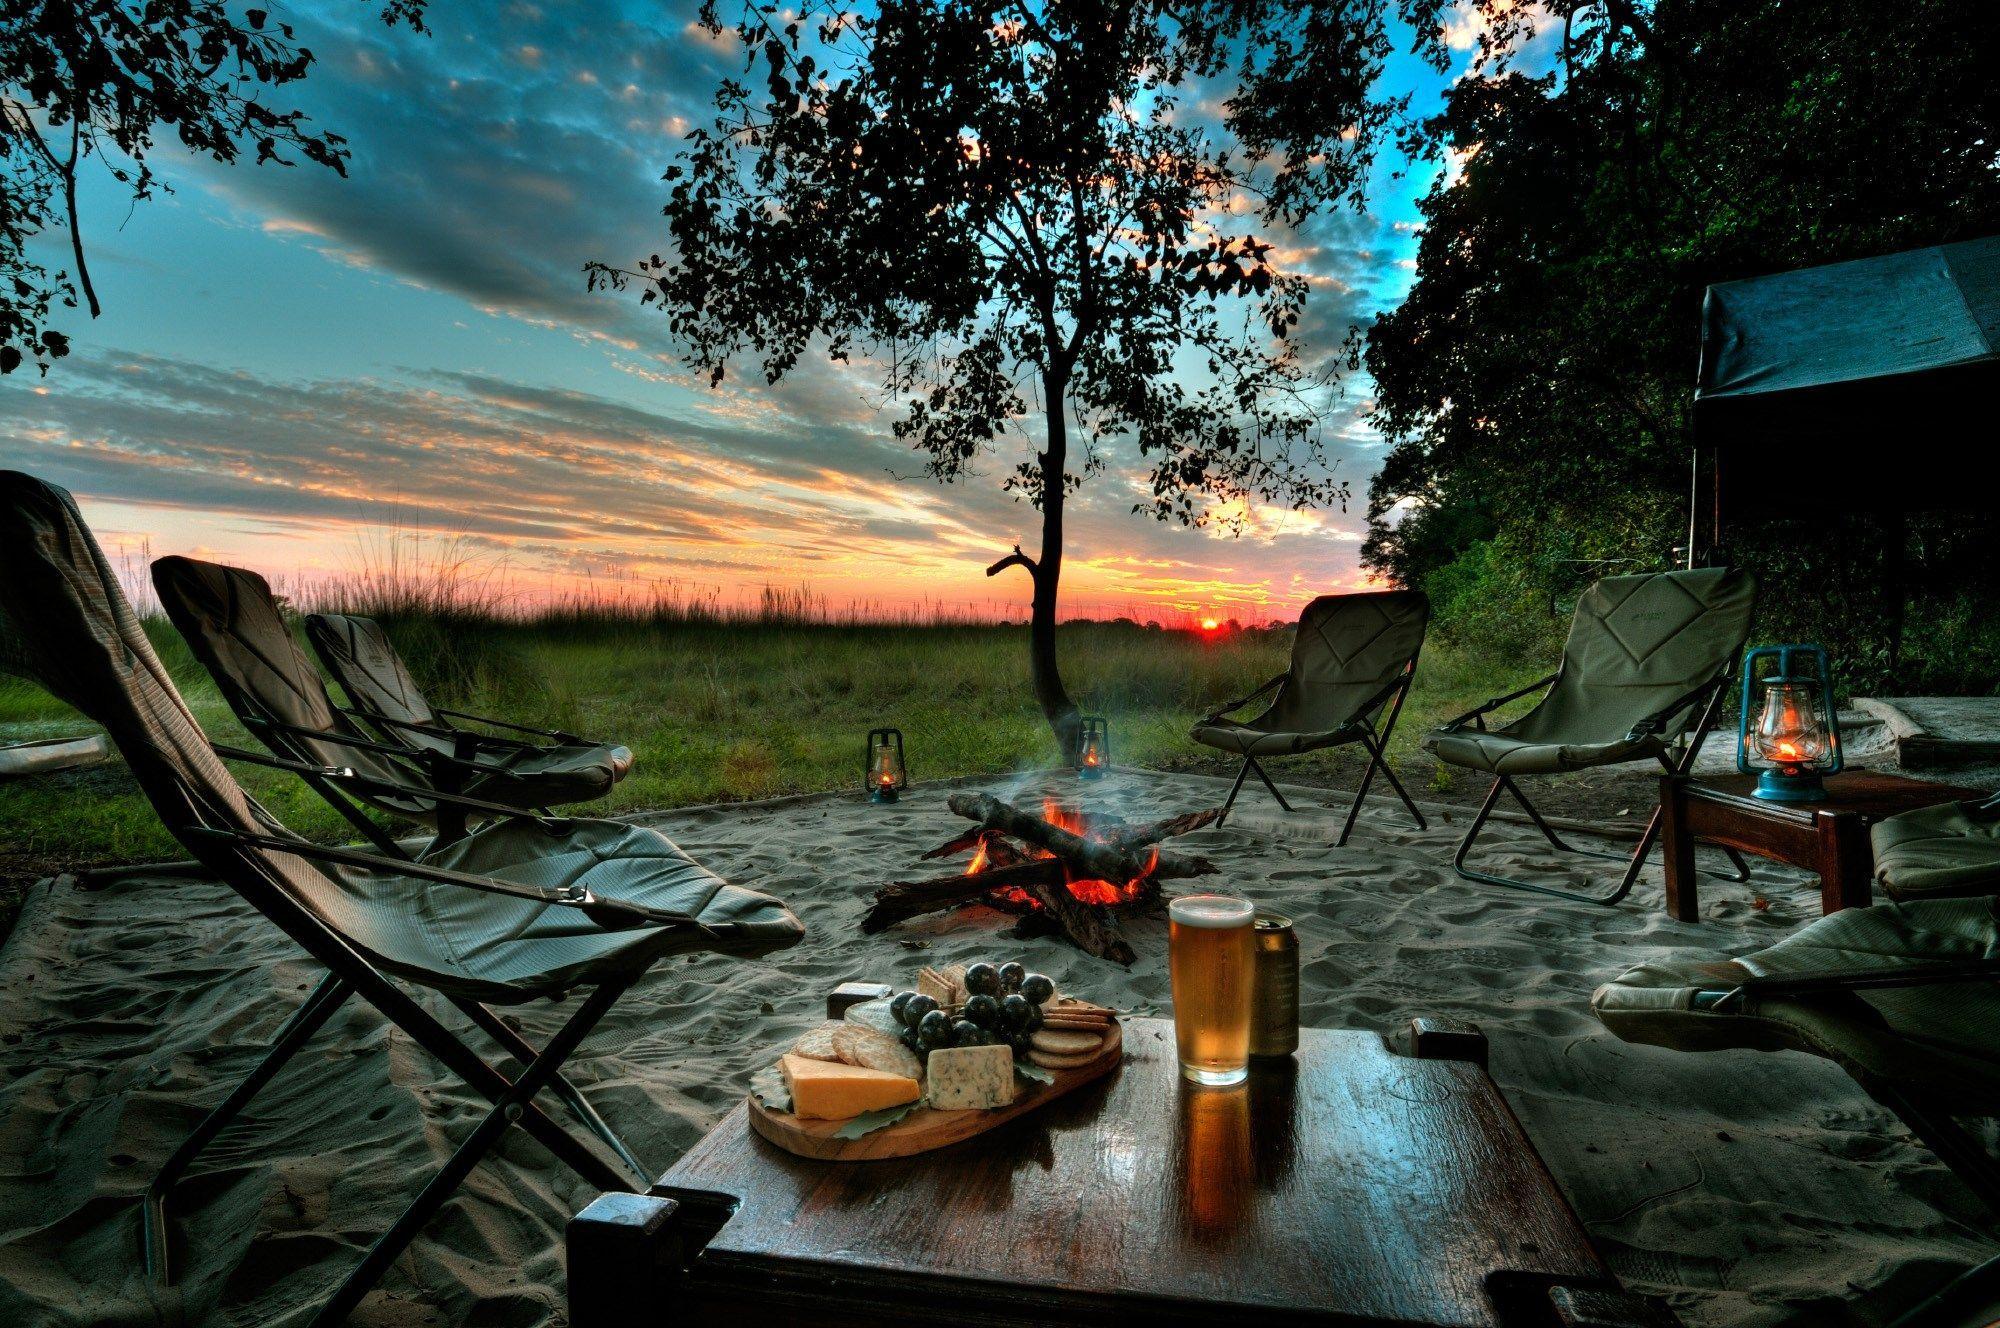 Camping Desktop Wallpapers   Top Camping Desktop Backgrounds 2000x1328